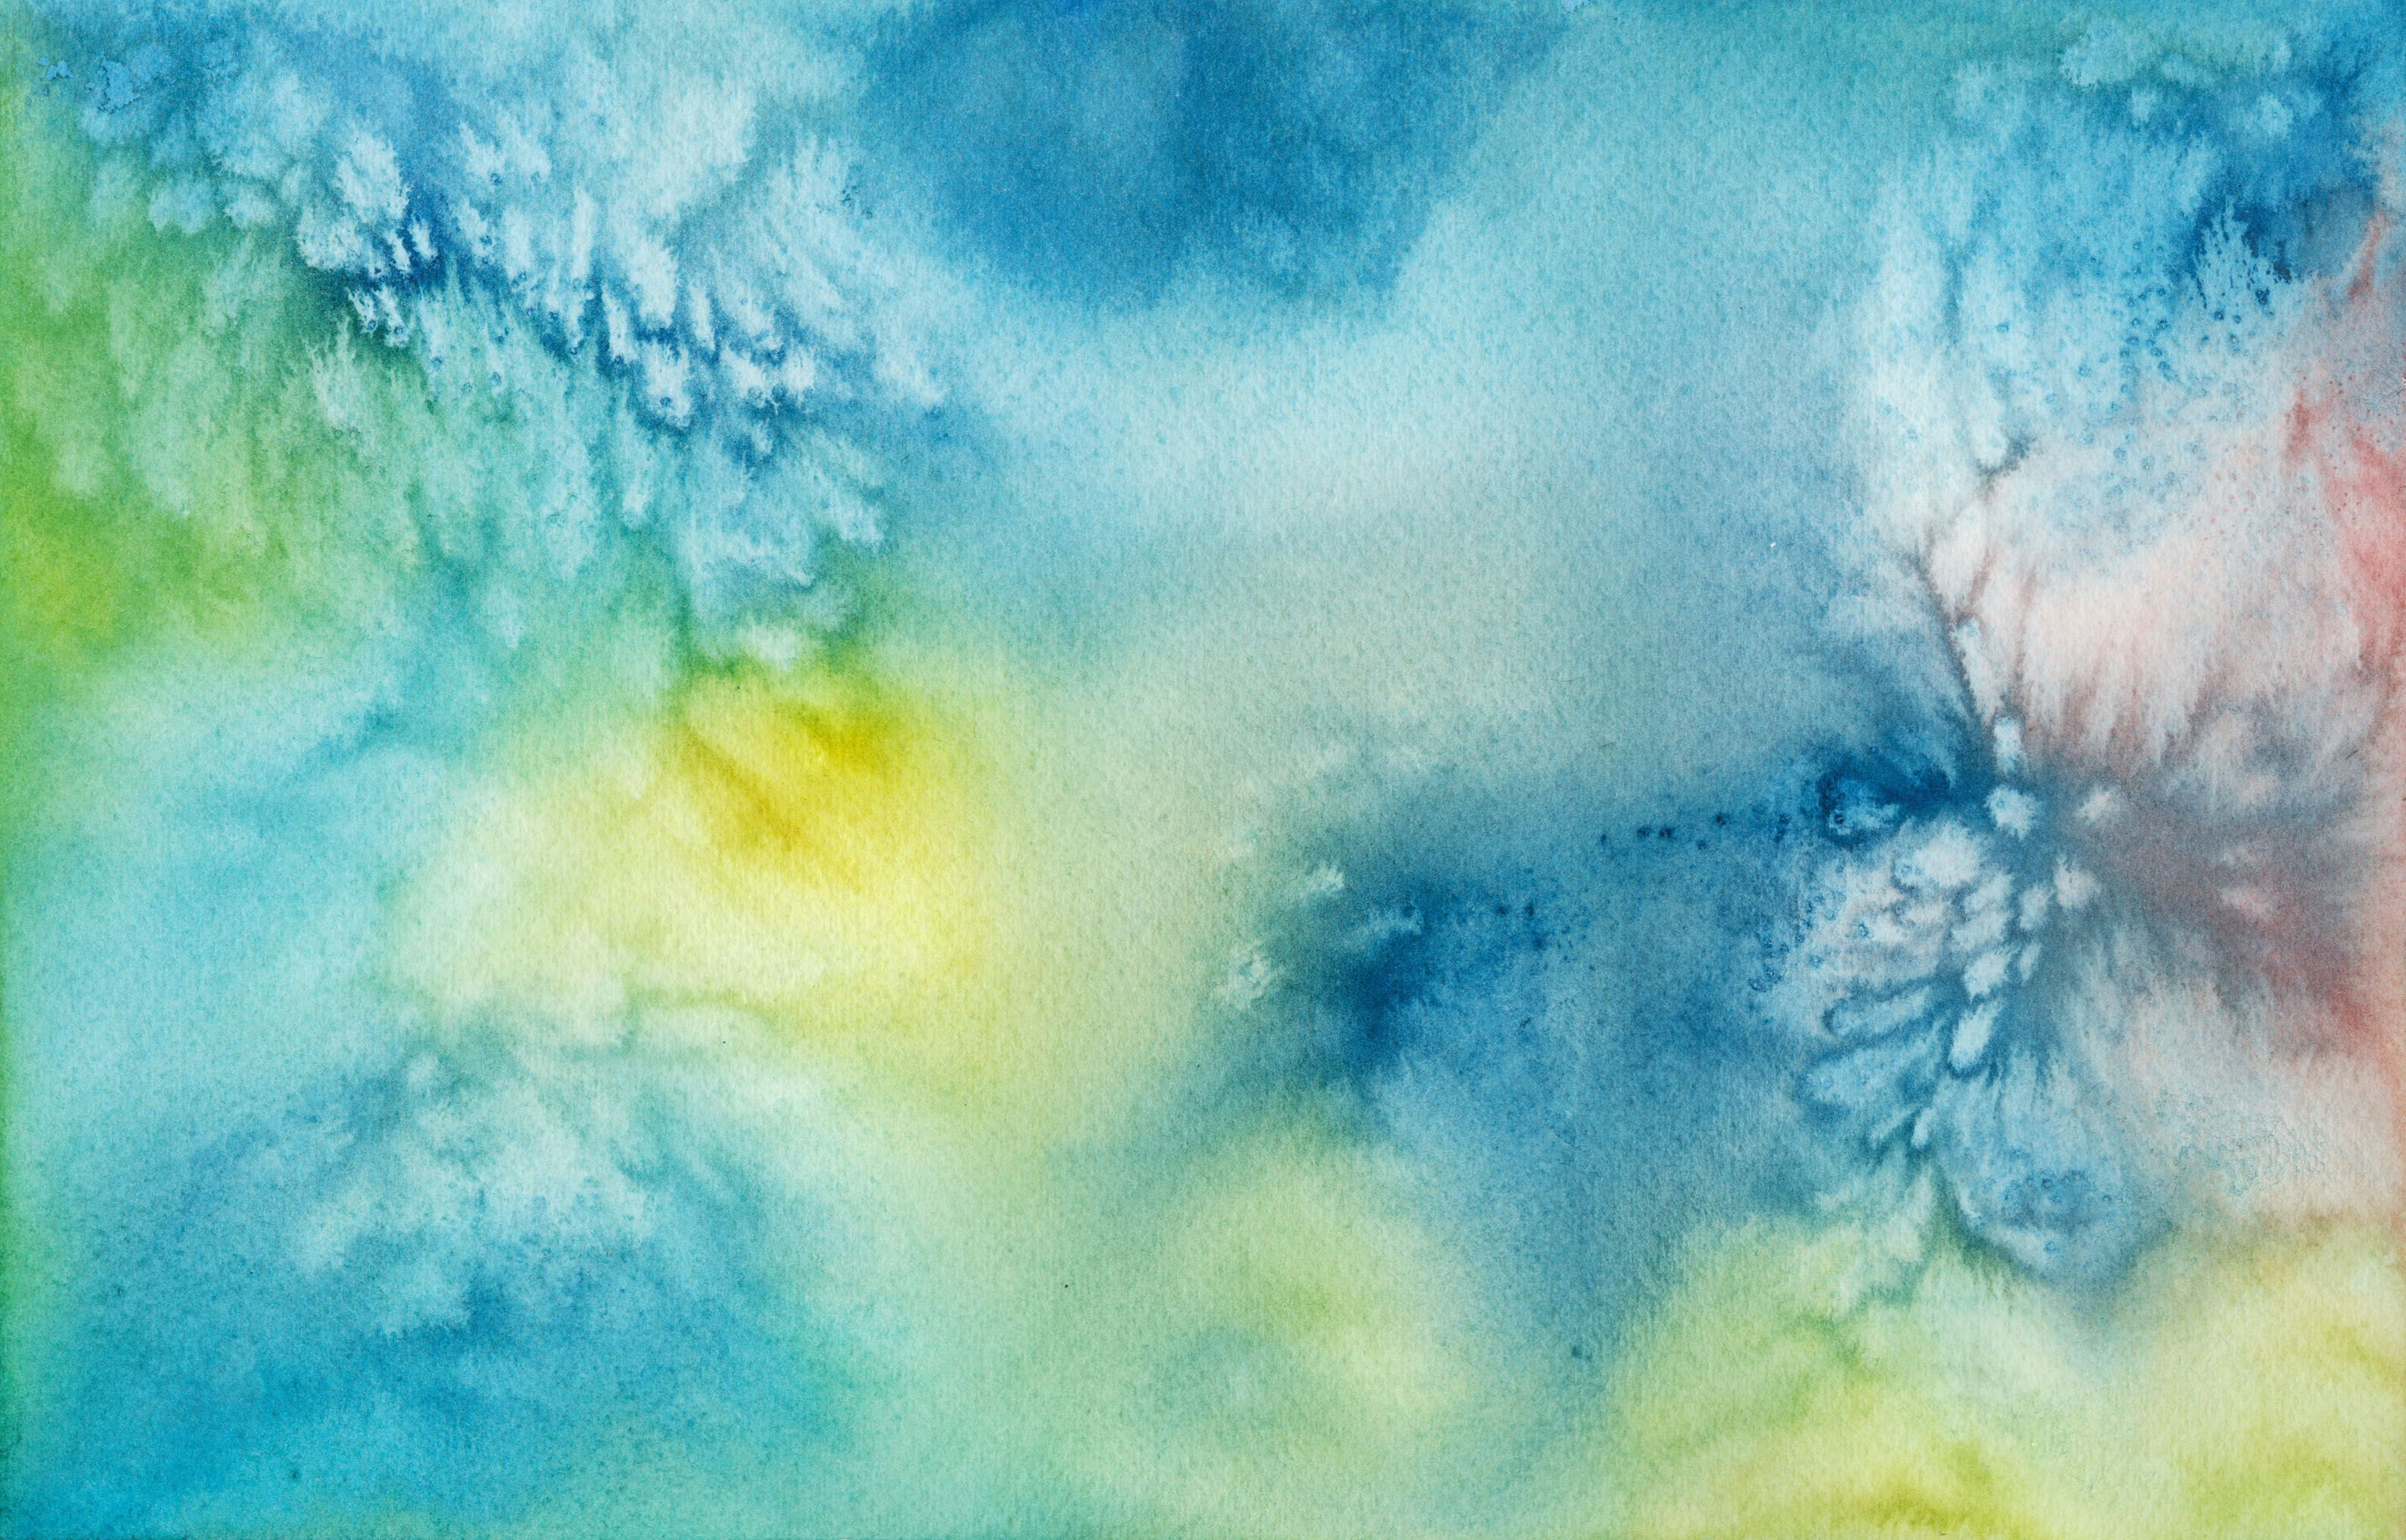 Watercolor Texture Stock 1 by ekohstock on deviantART